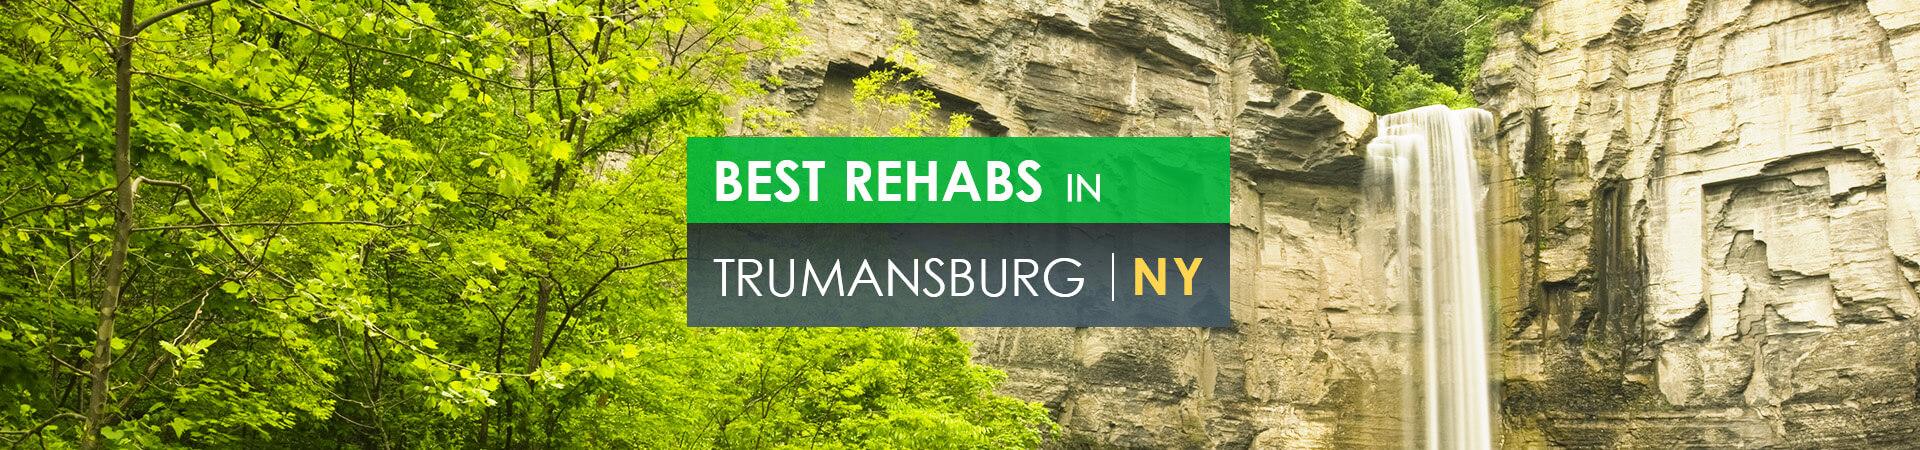 Best rehabs in Trumansburg, NY